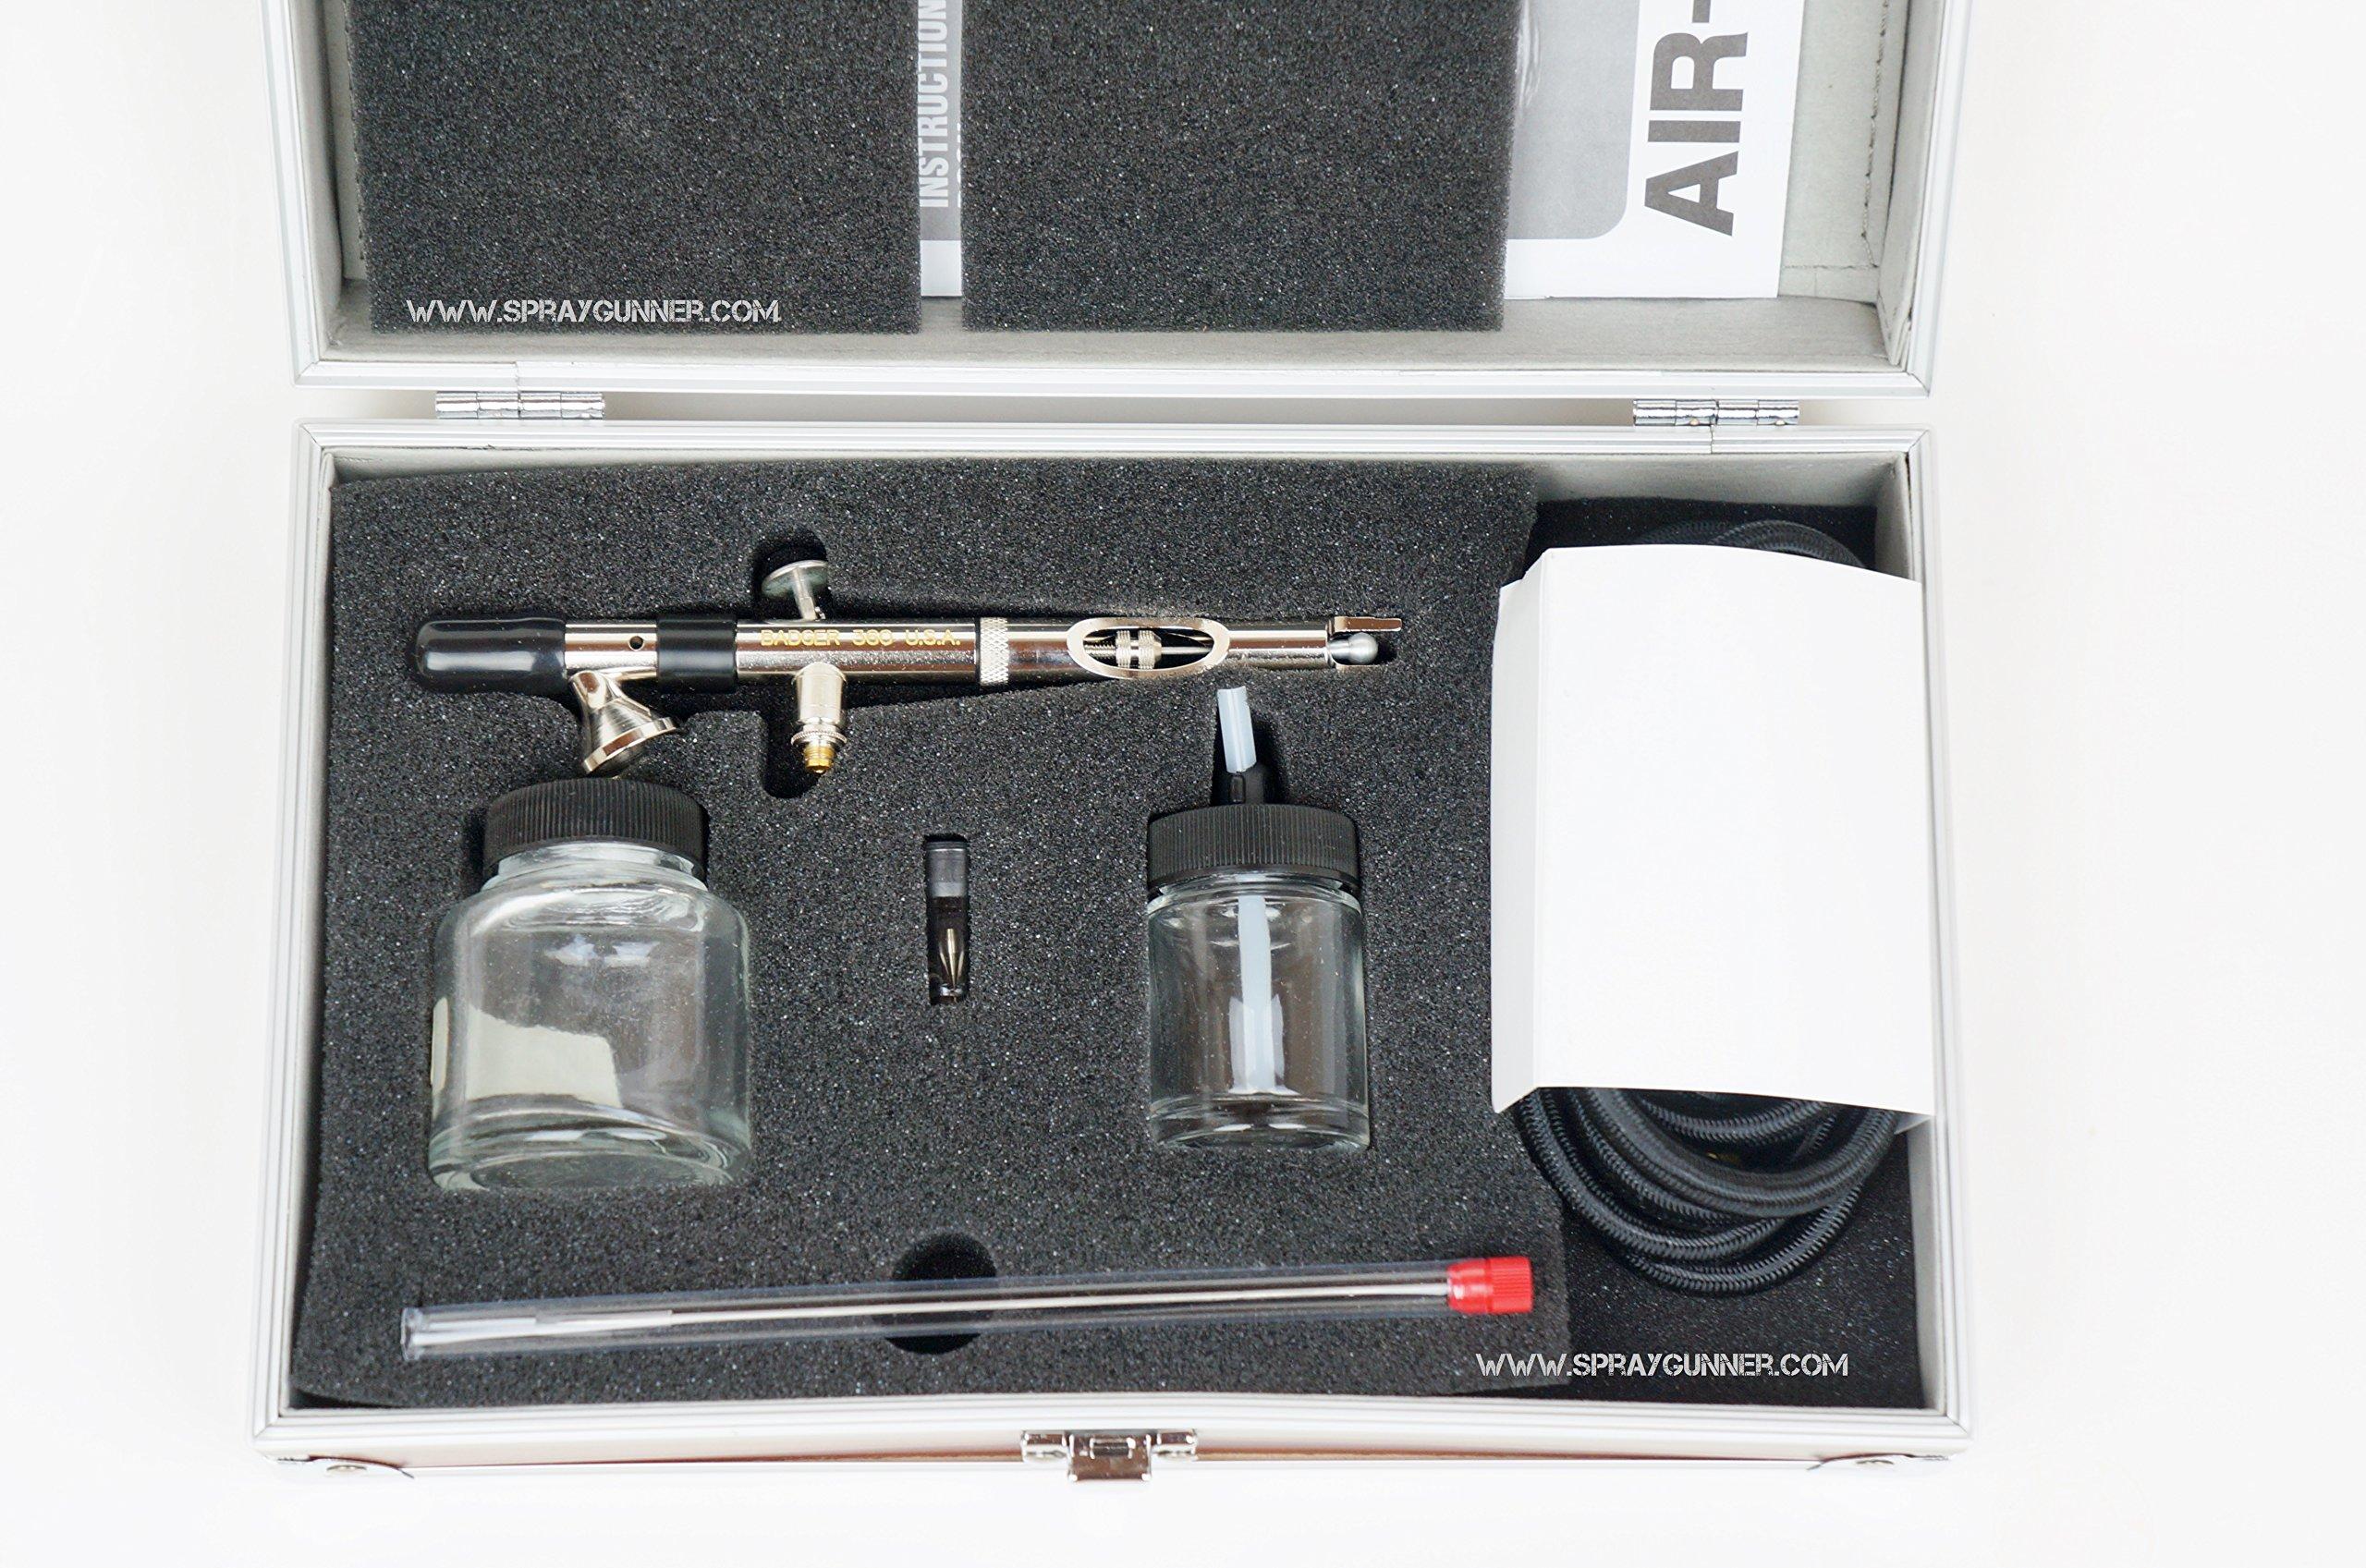 Badger 360 Universal Airbrush Set in Wood Grain Storage Case + BONUS by SprayGunner